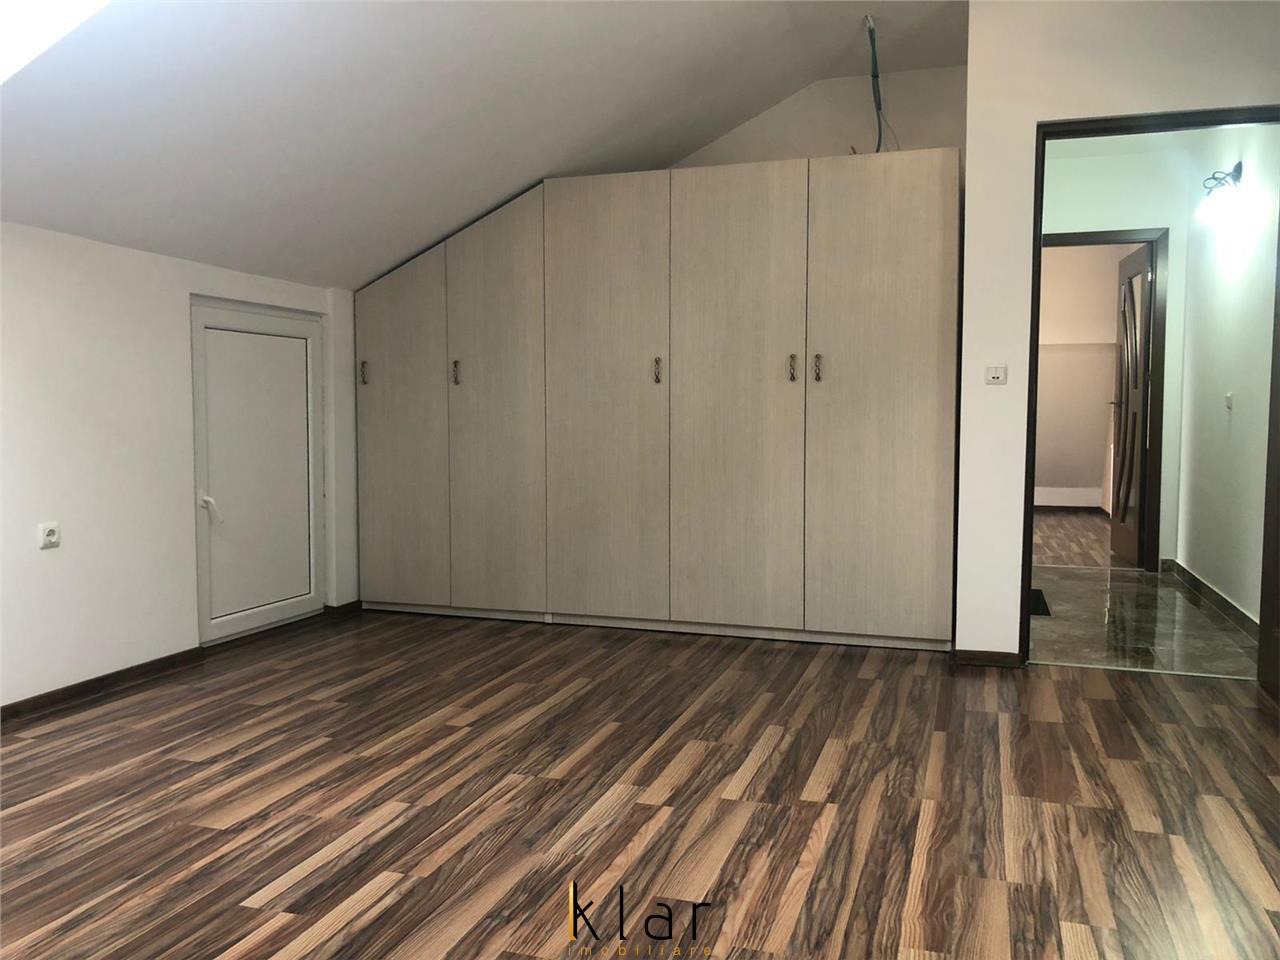 De vanzare un apartament pe 2 nivele int-o zona de case panorama  frumoasa!